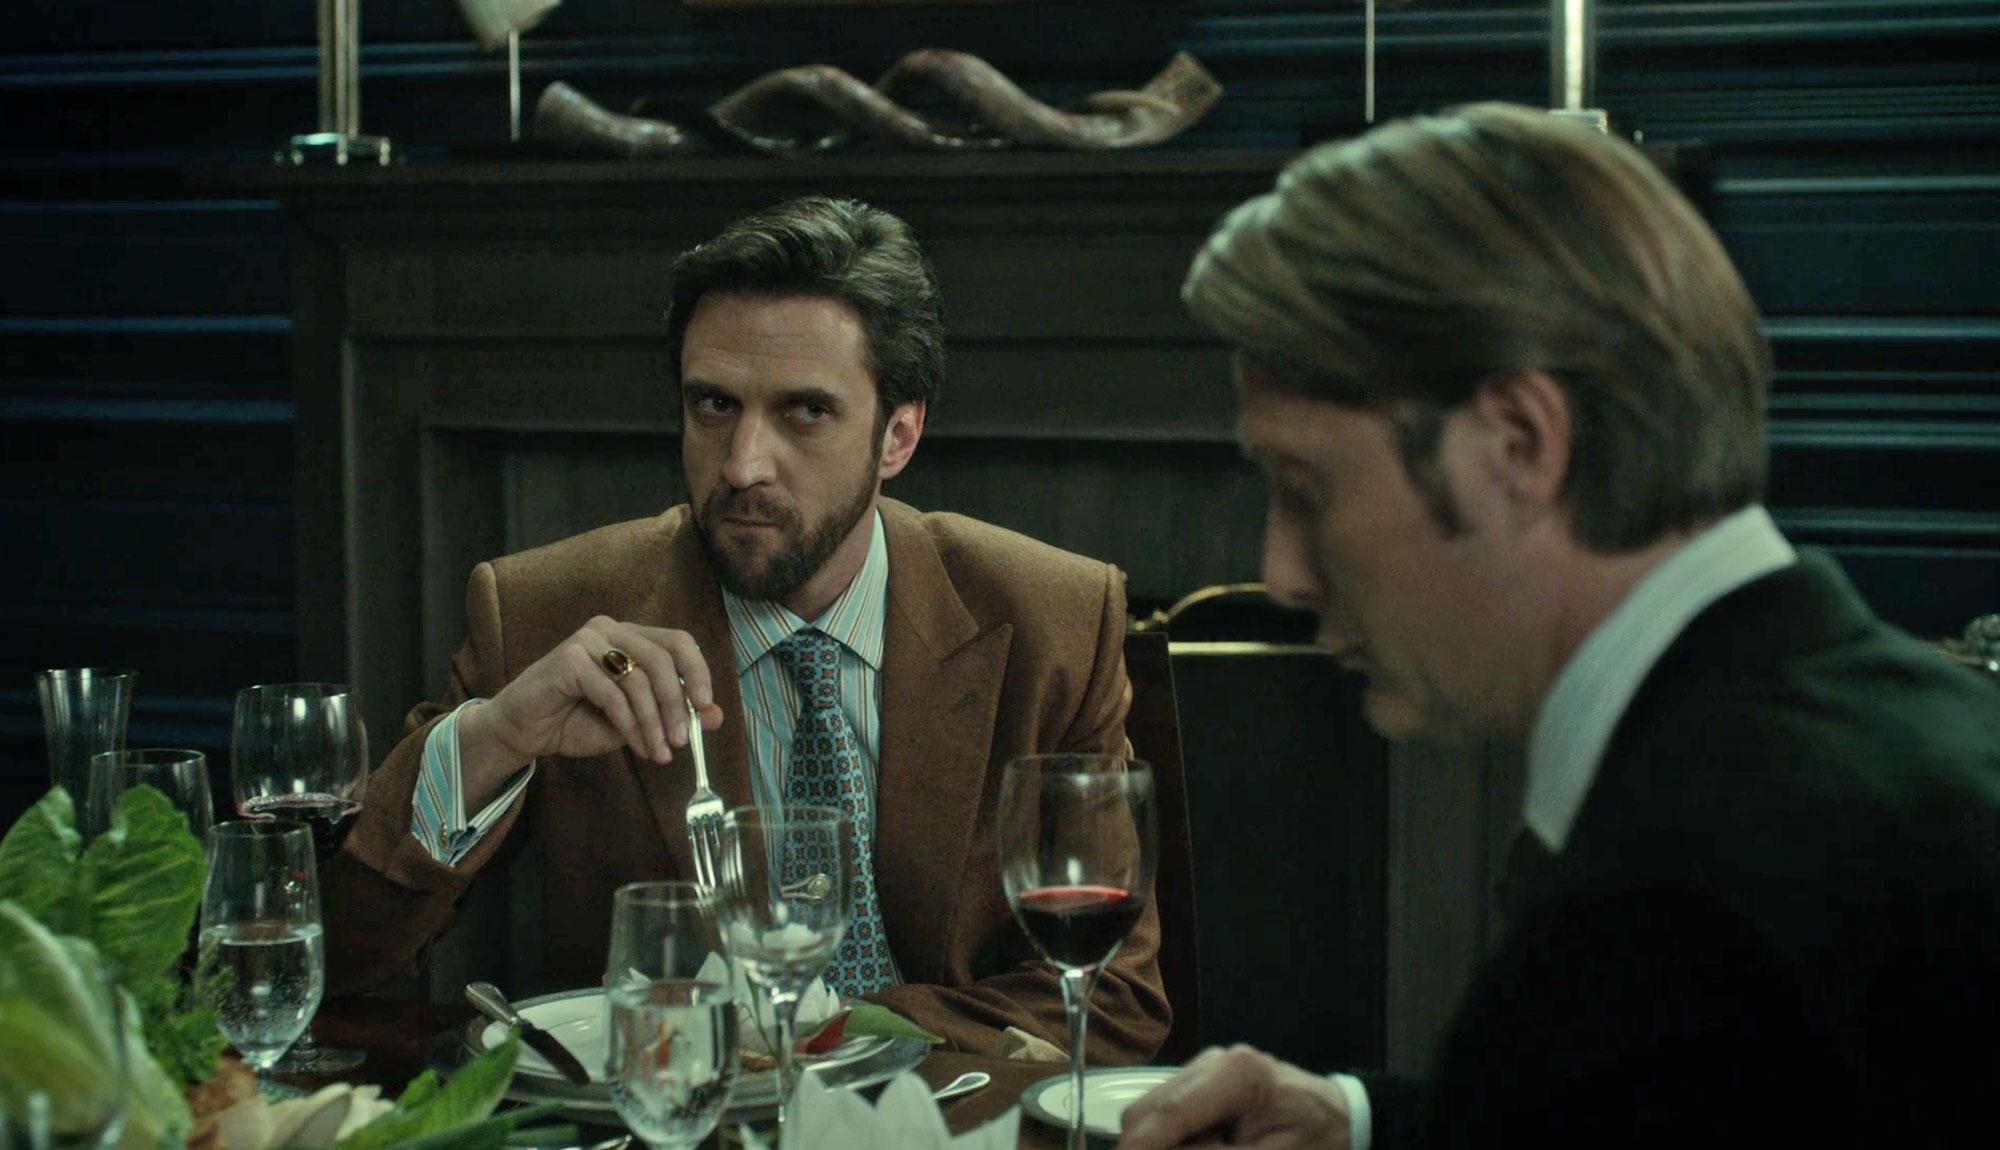 Double Breasted Camel Blazer Dr Chiltern studies Hannibal over dinner